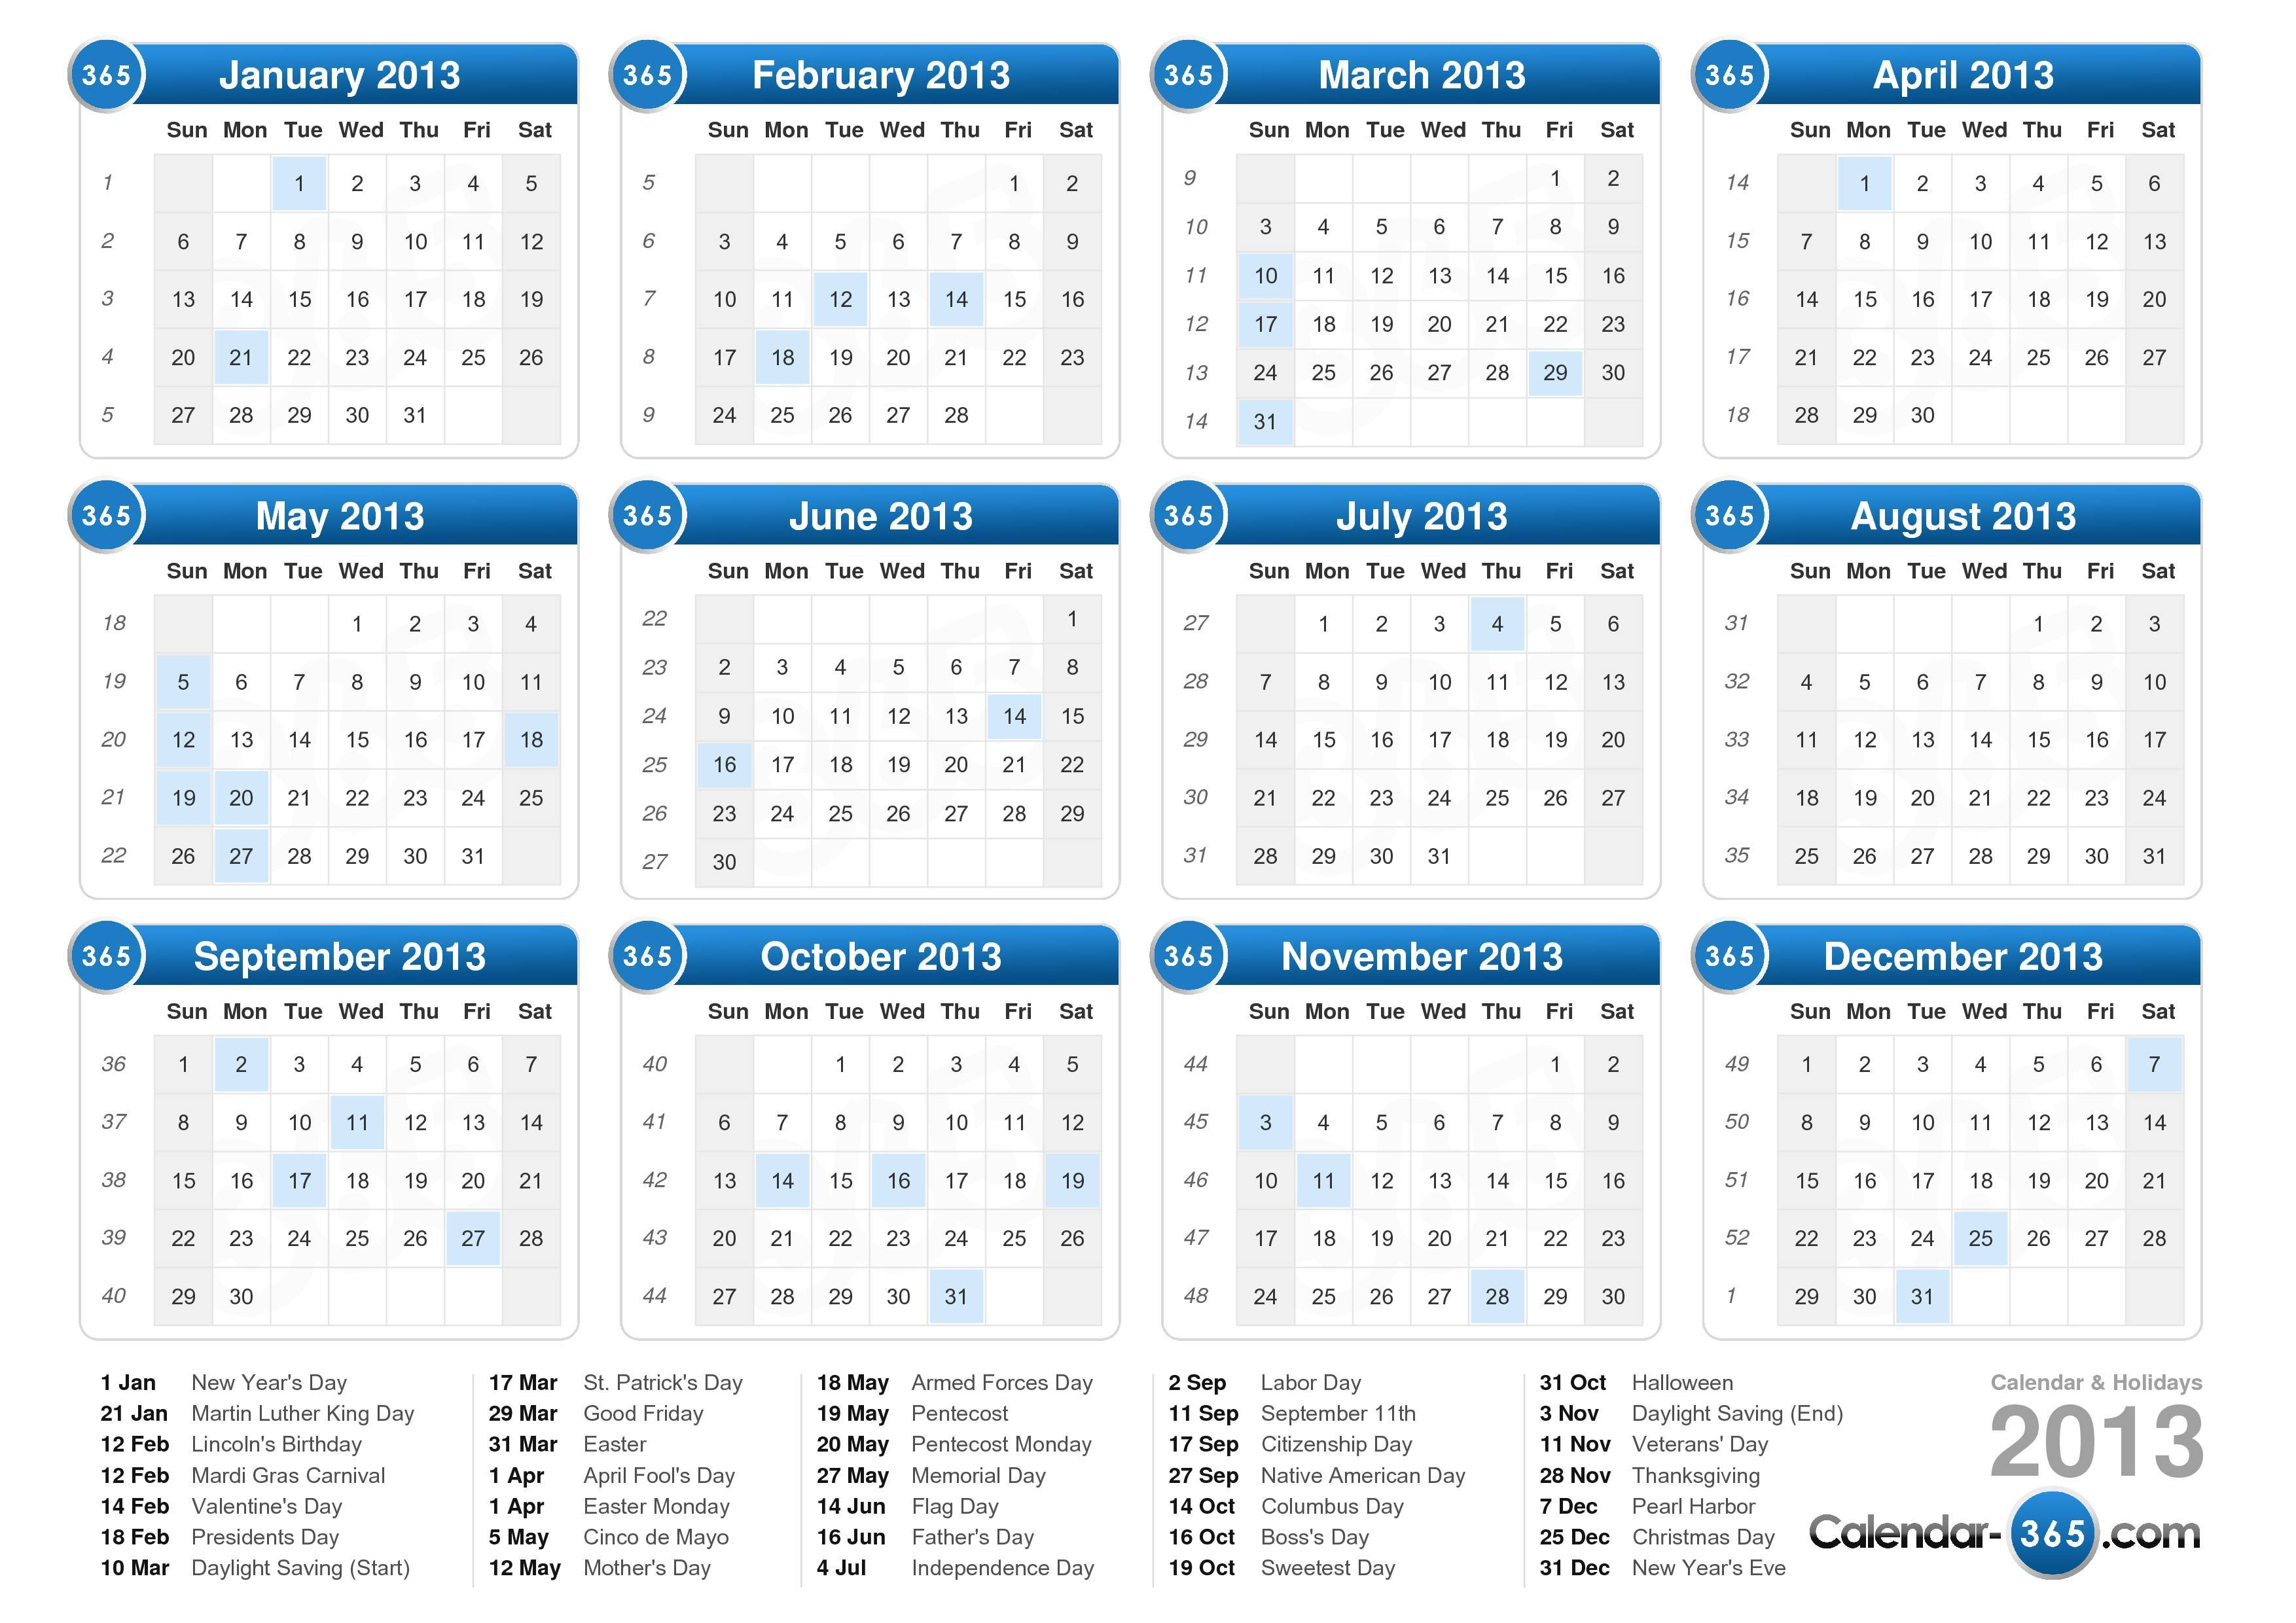 Free Printable Calendars September 2013 Free Printable Calendars The Spruce 2013 Calendar